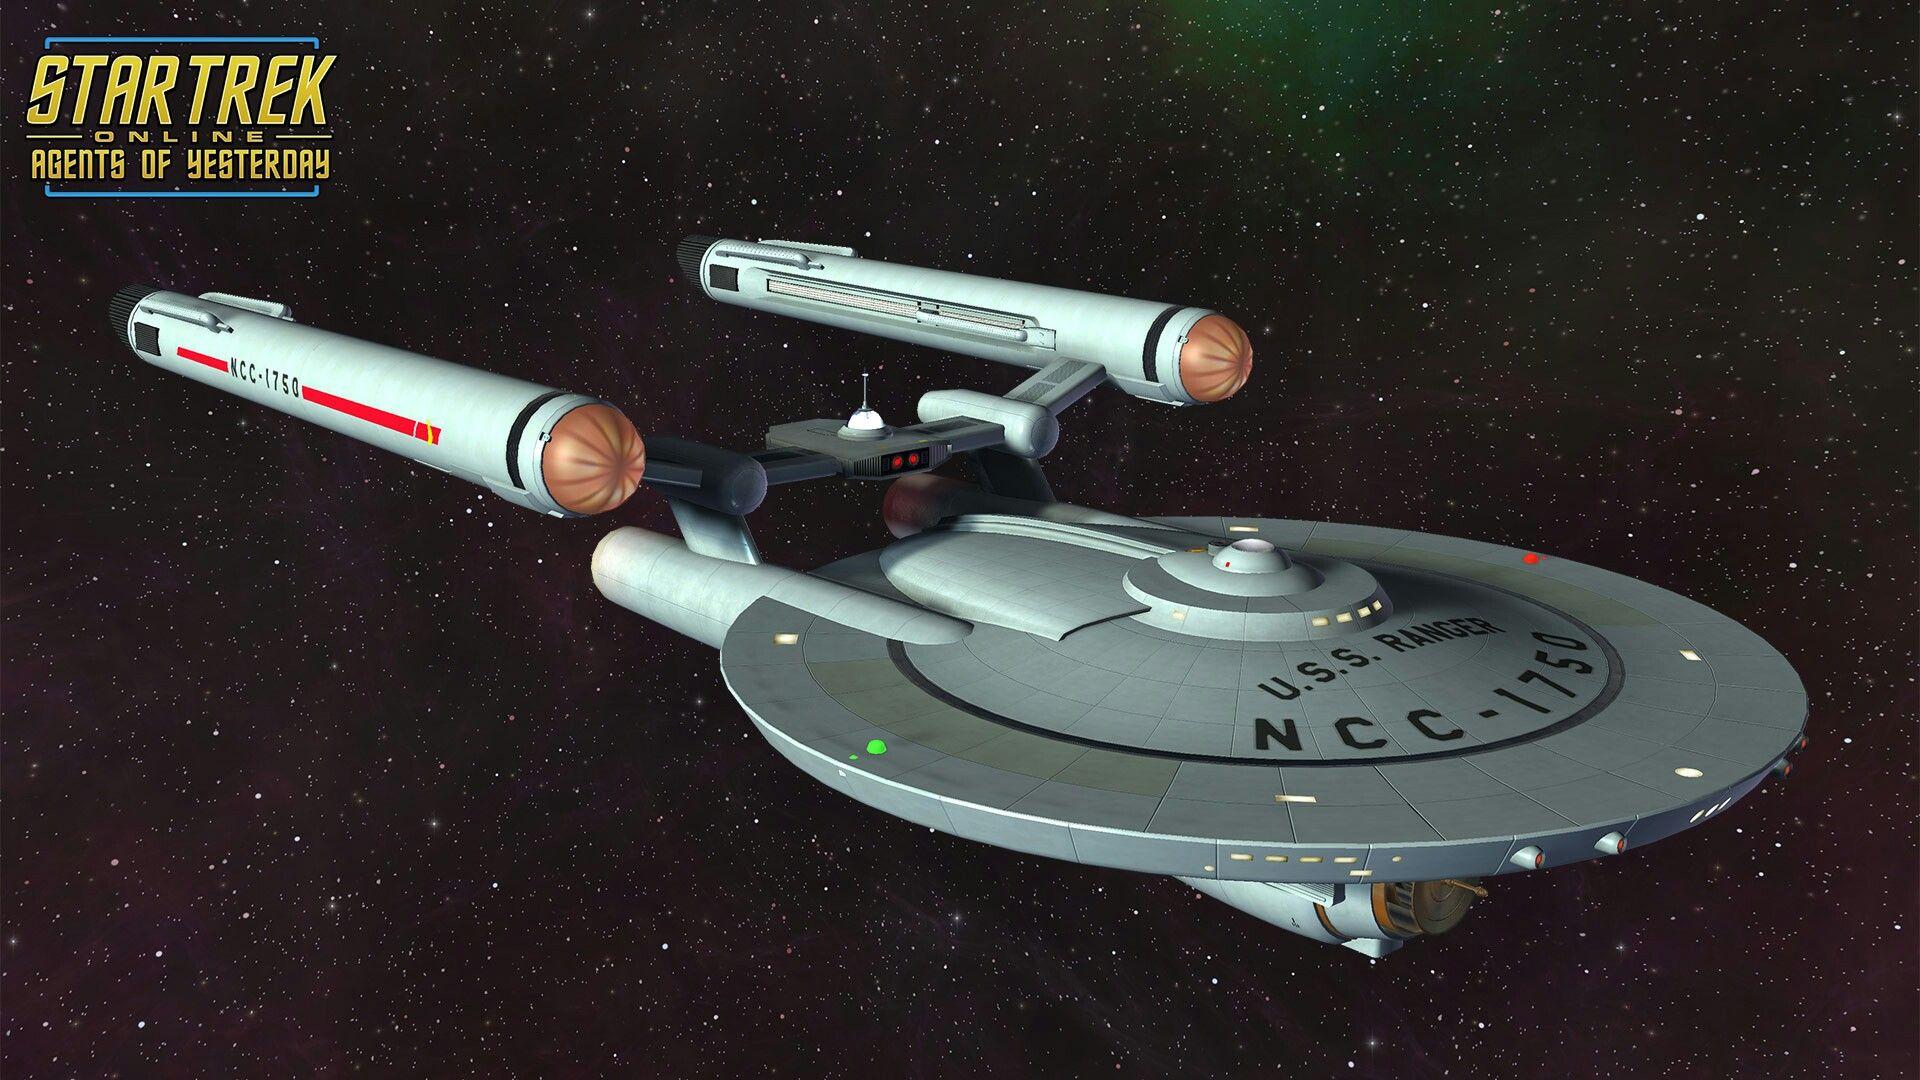 Star Trek (TOS) era: Ranger-class Starship (variant) | Star